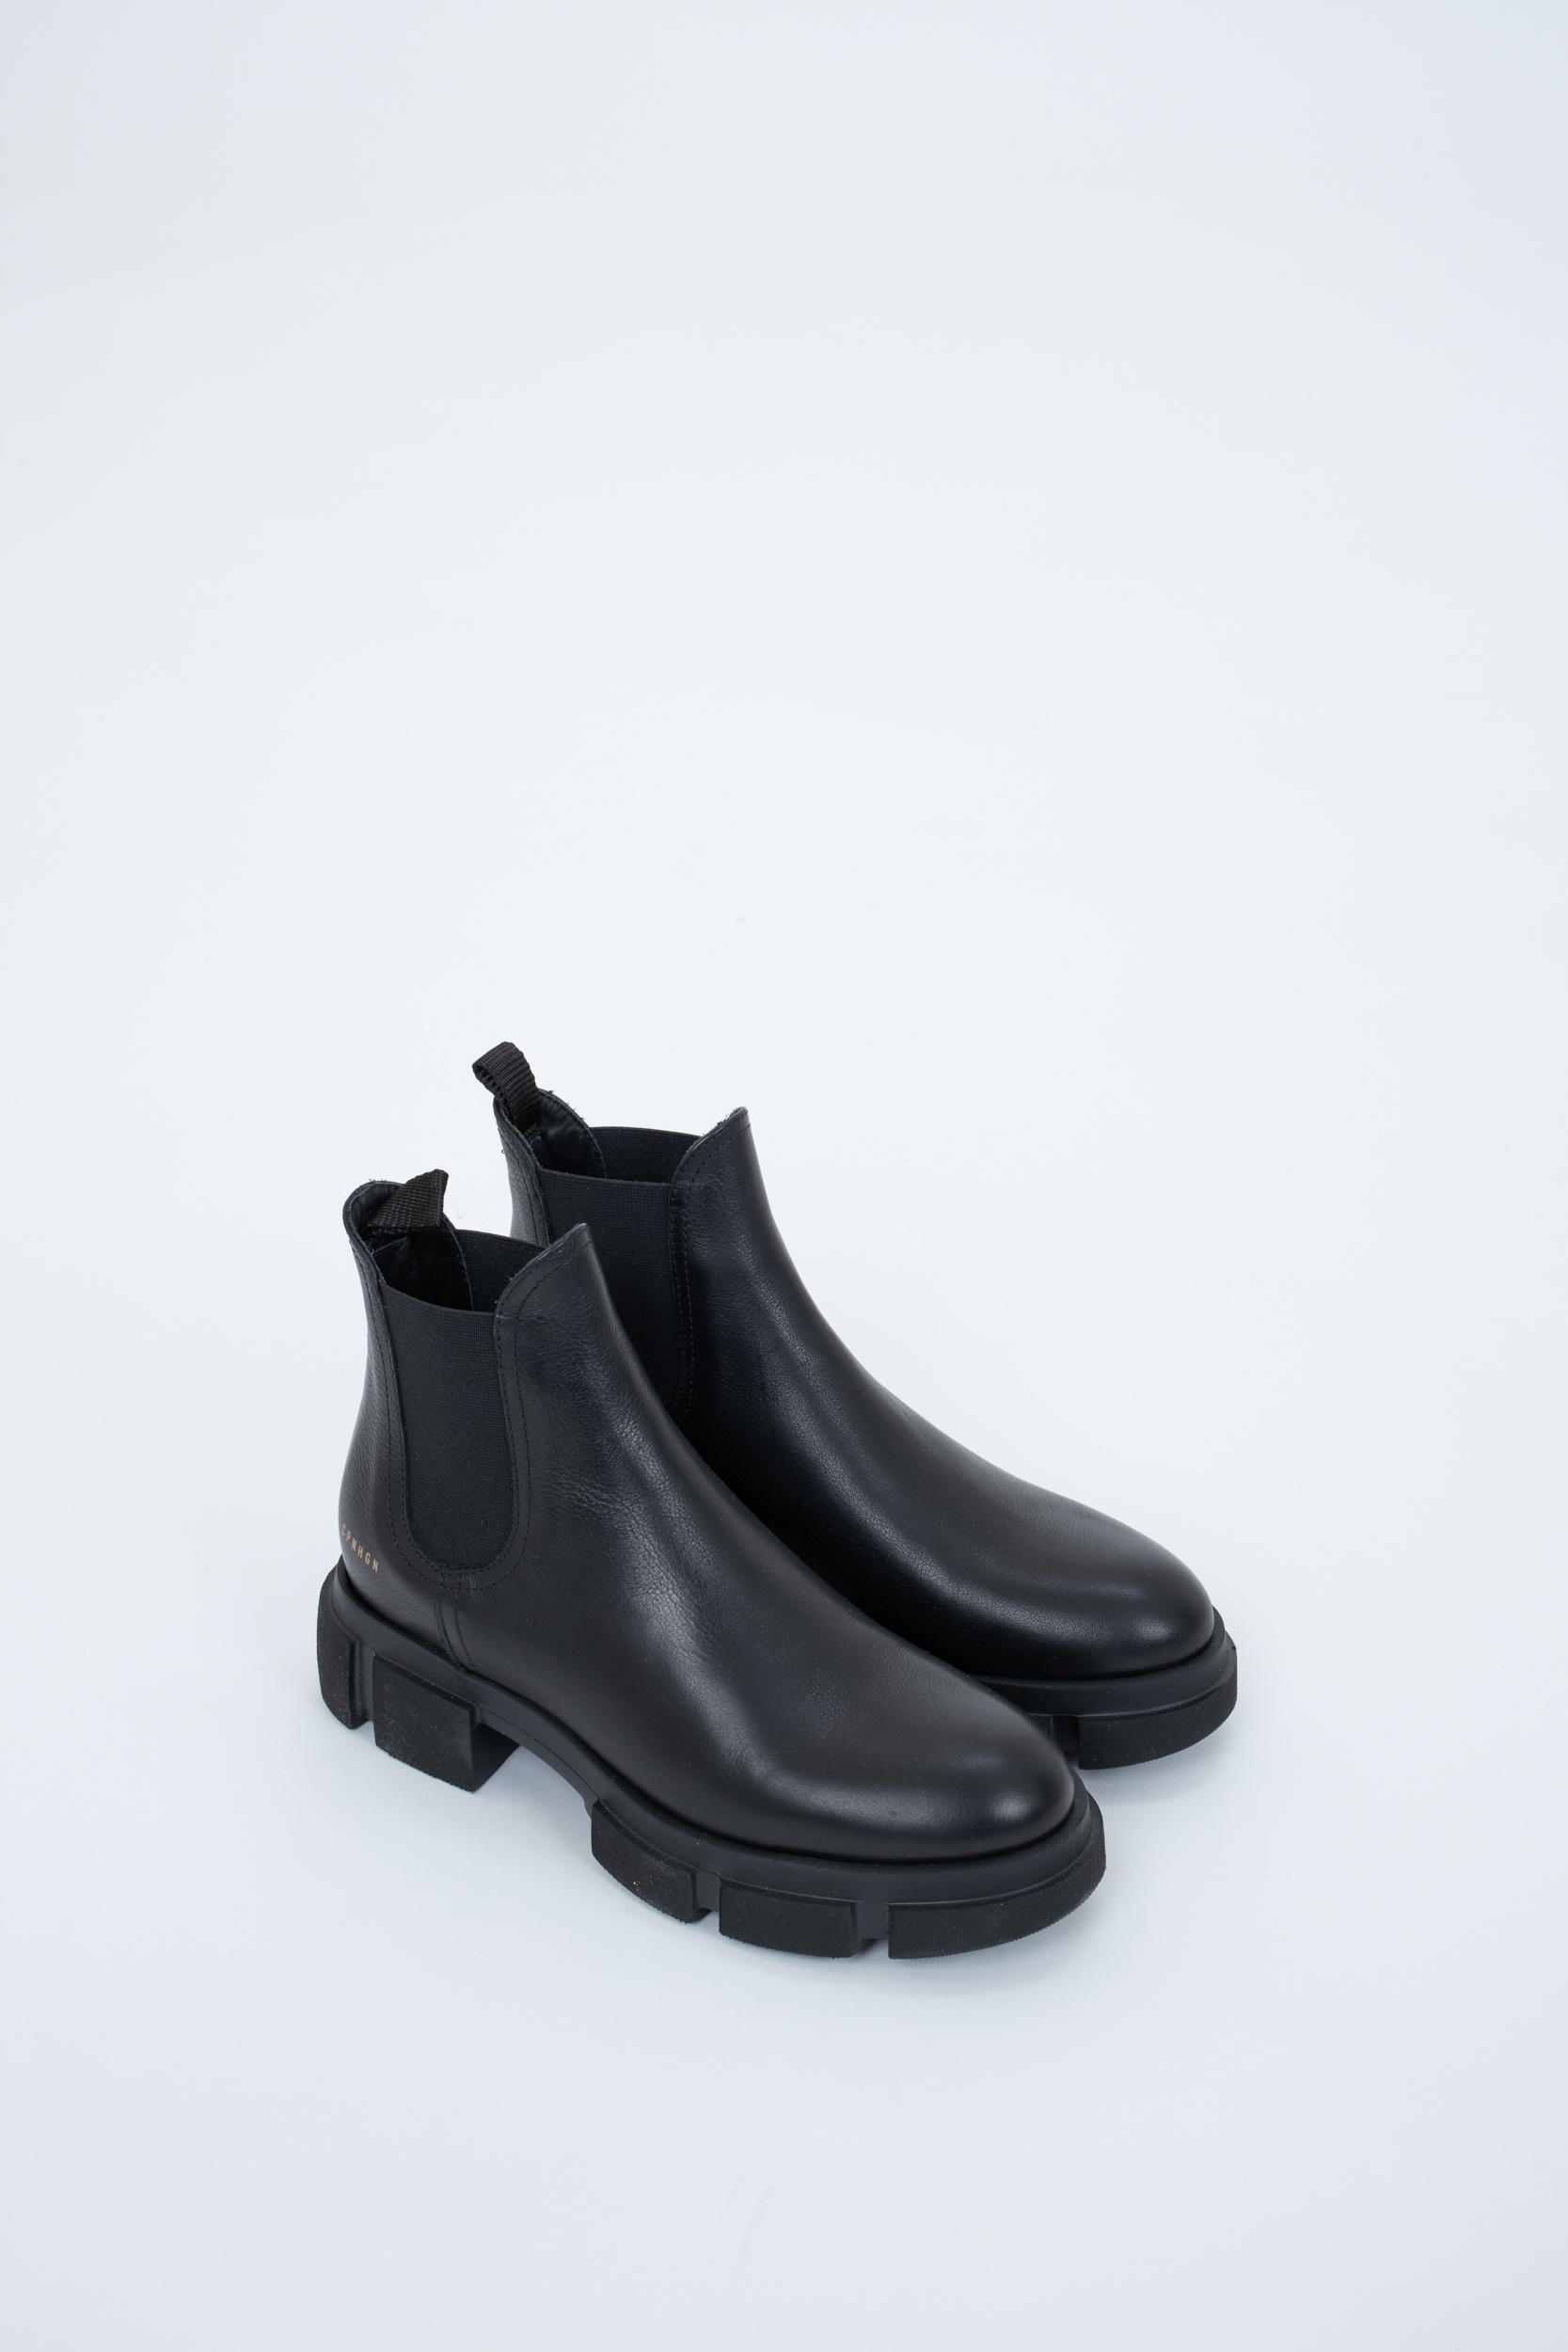 CPH521 Vitello Black